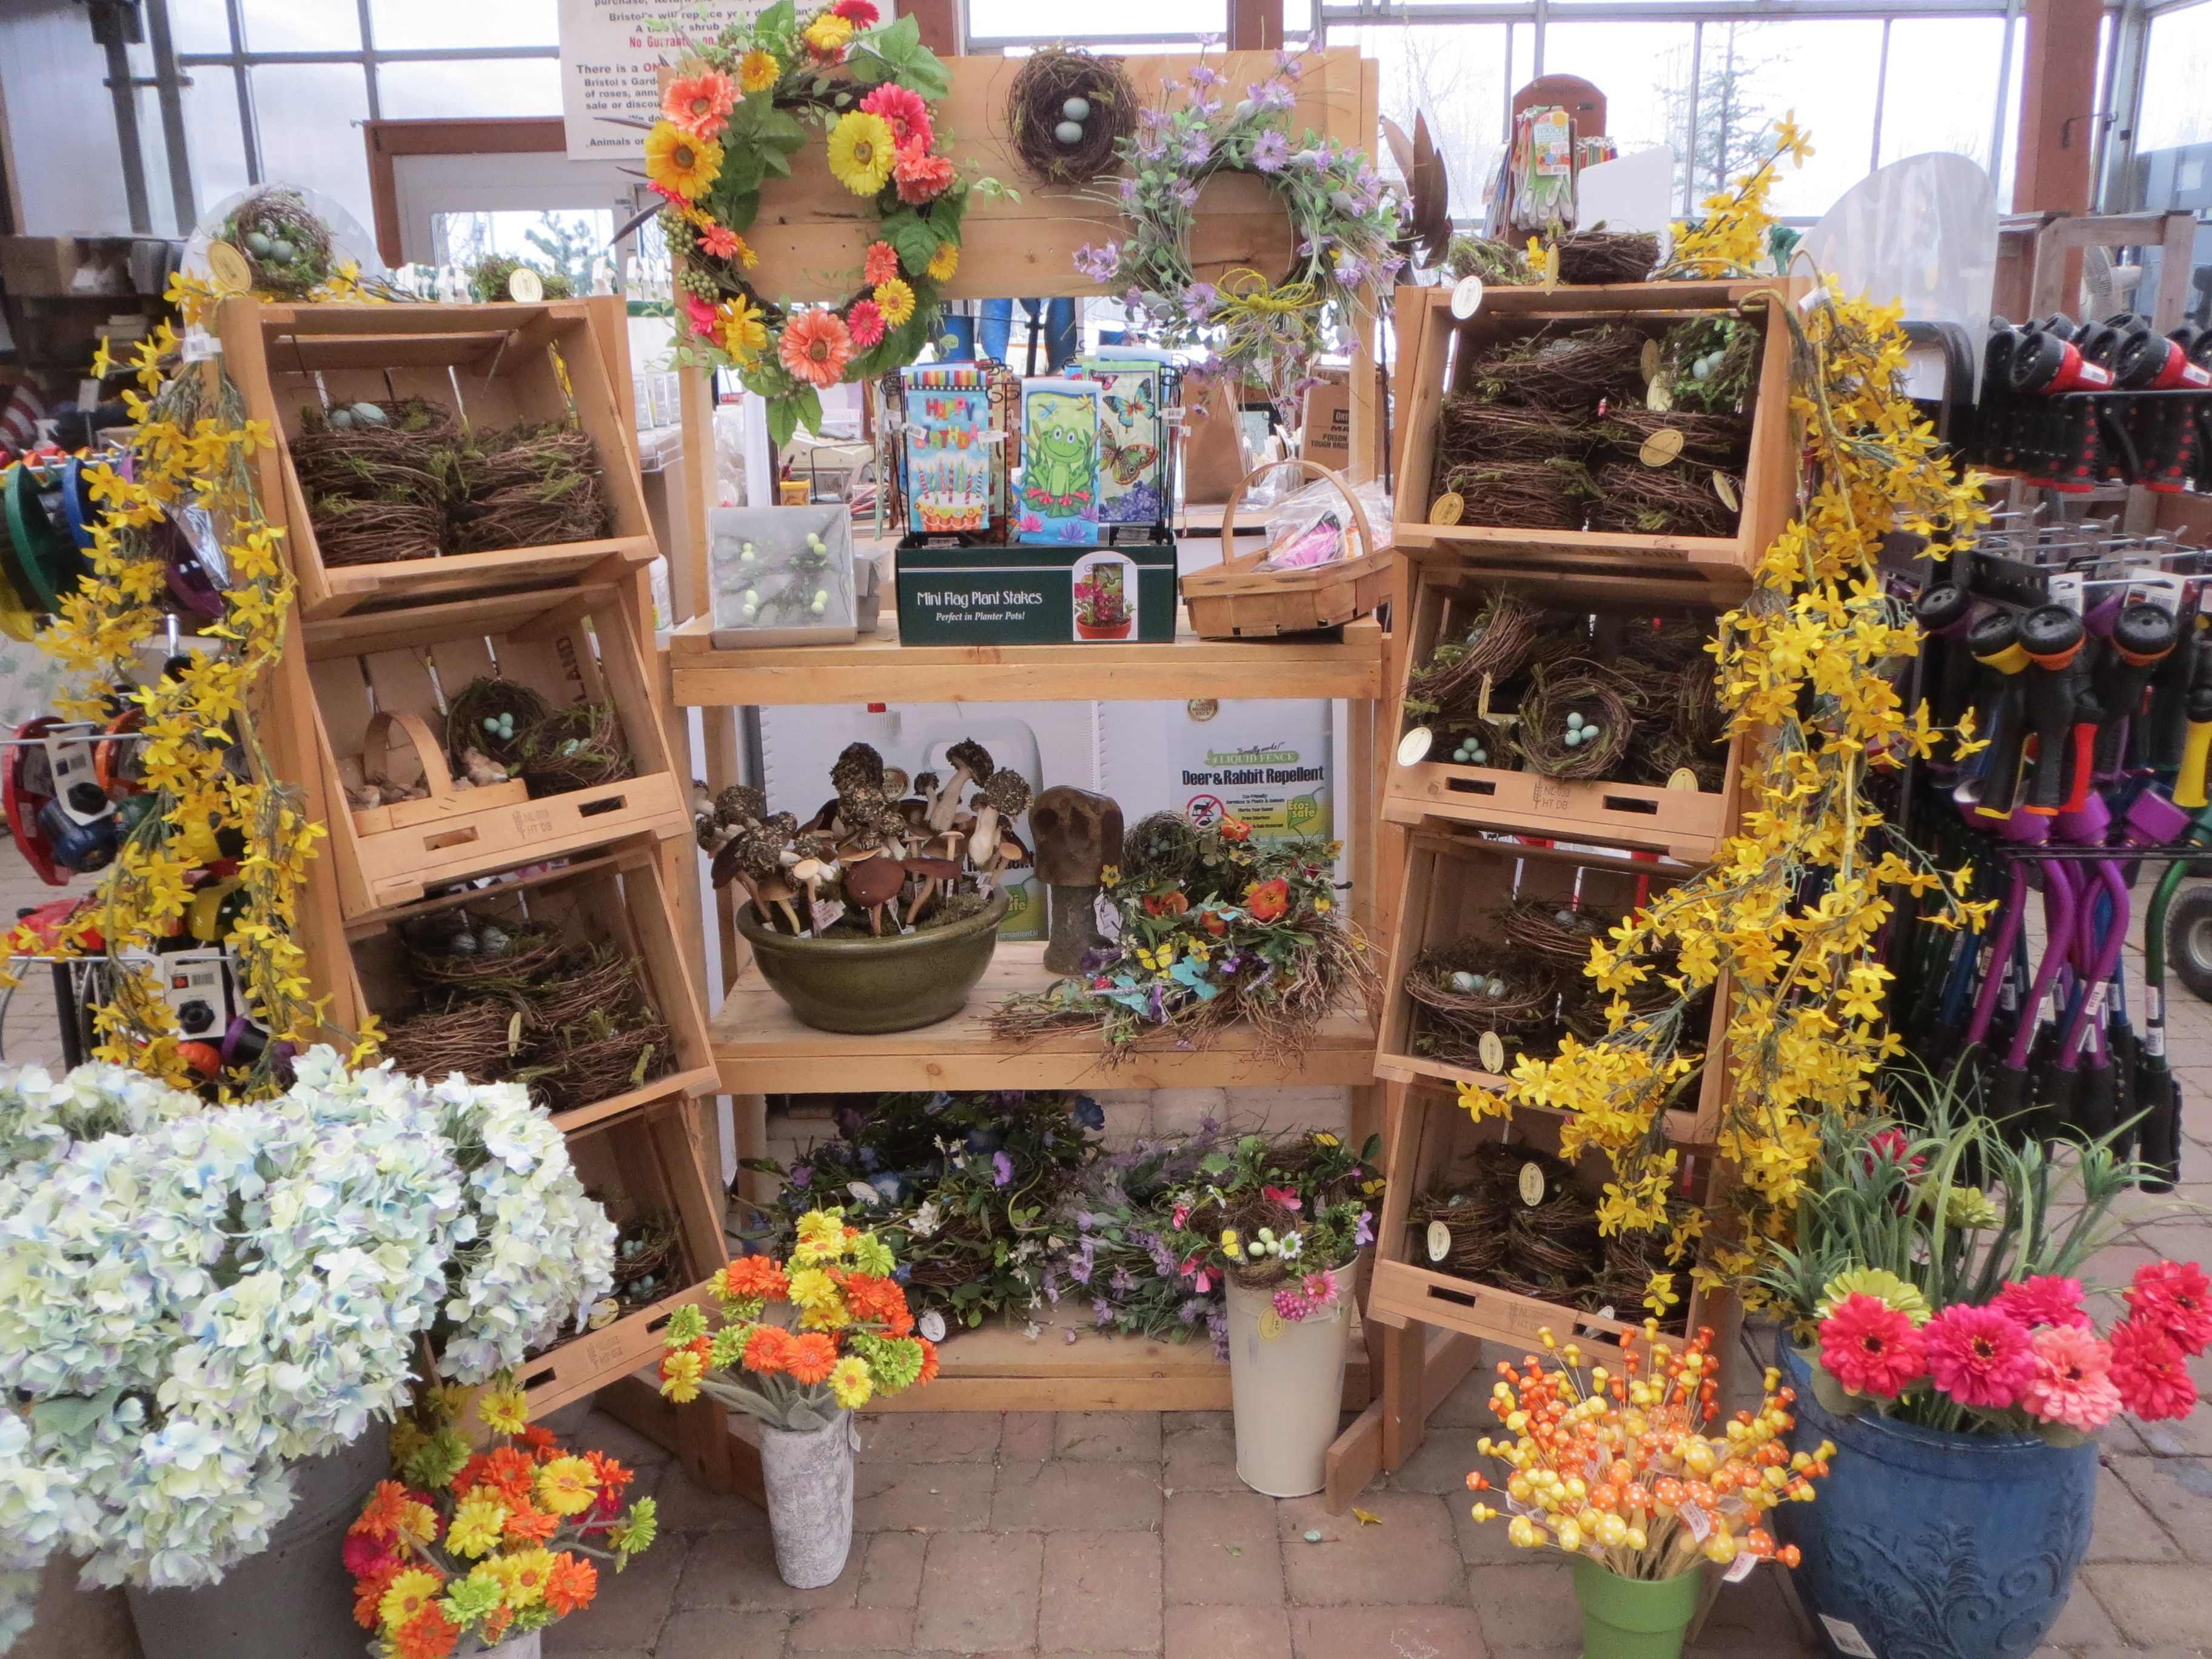 Spring has sprung at Bristol's Garden Center (Victor, NY